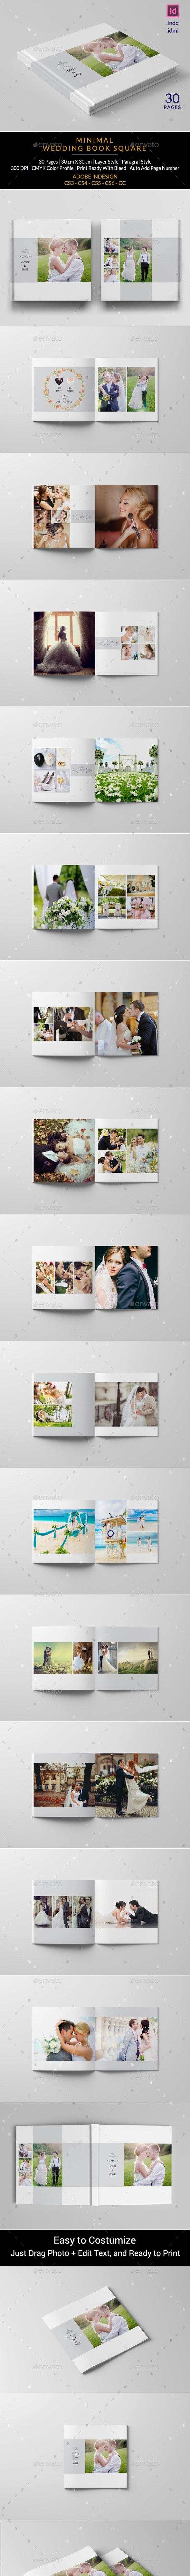 Minimalist Square Wedding Album - Photo Albums Print Templates